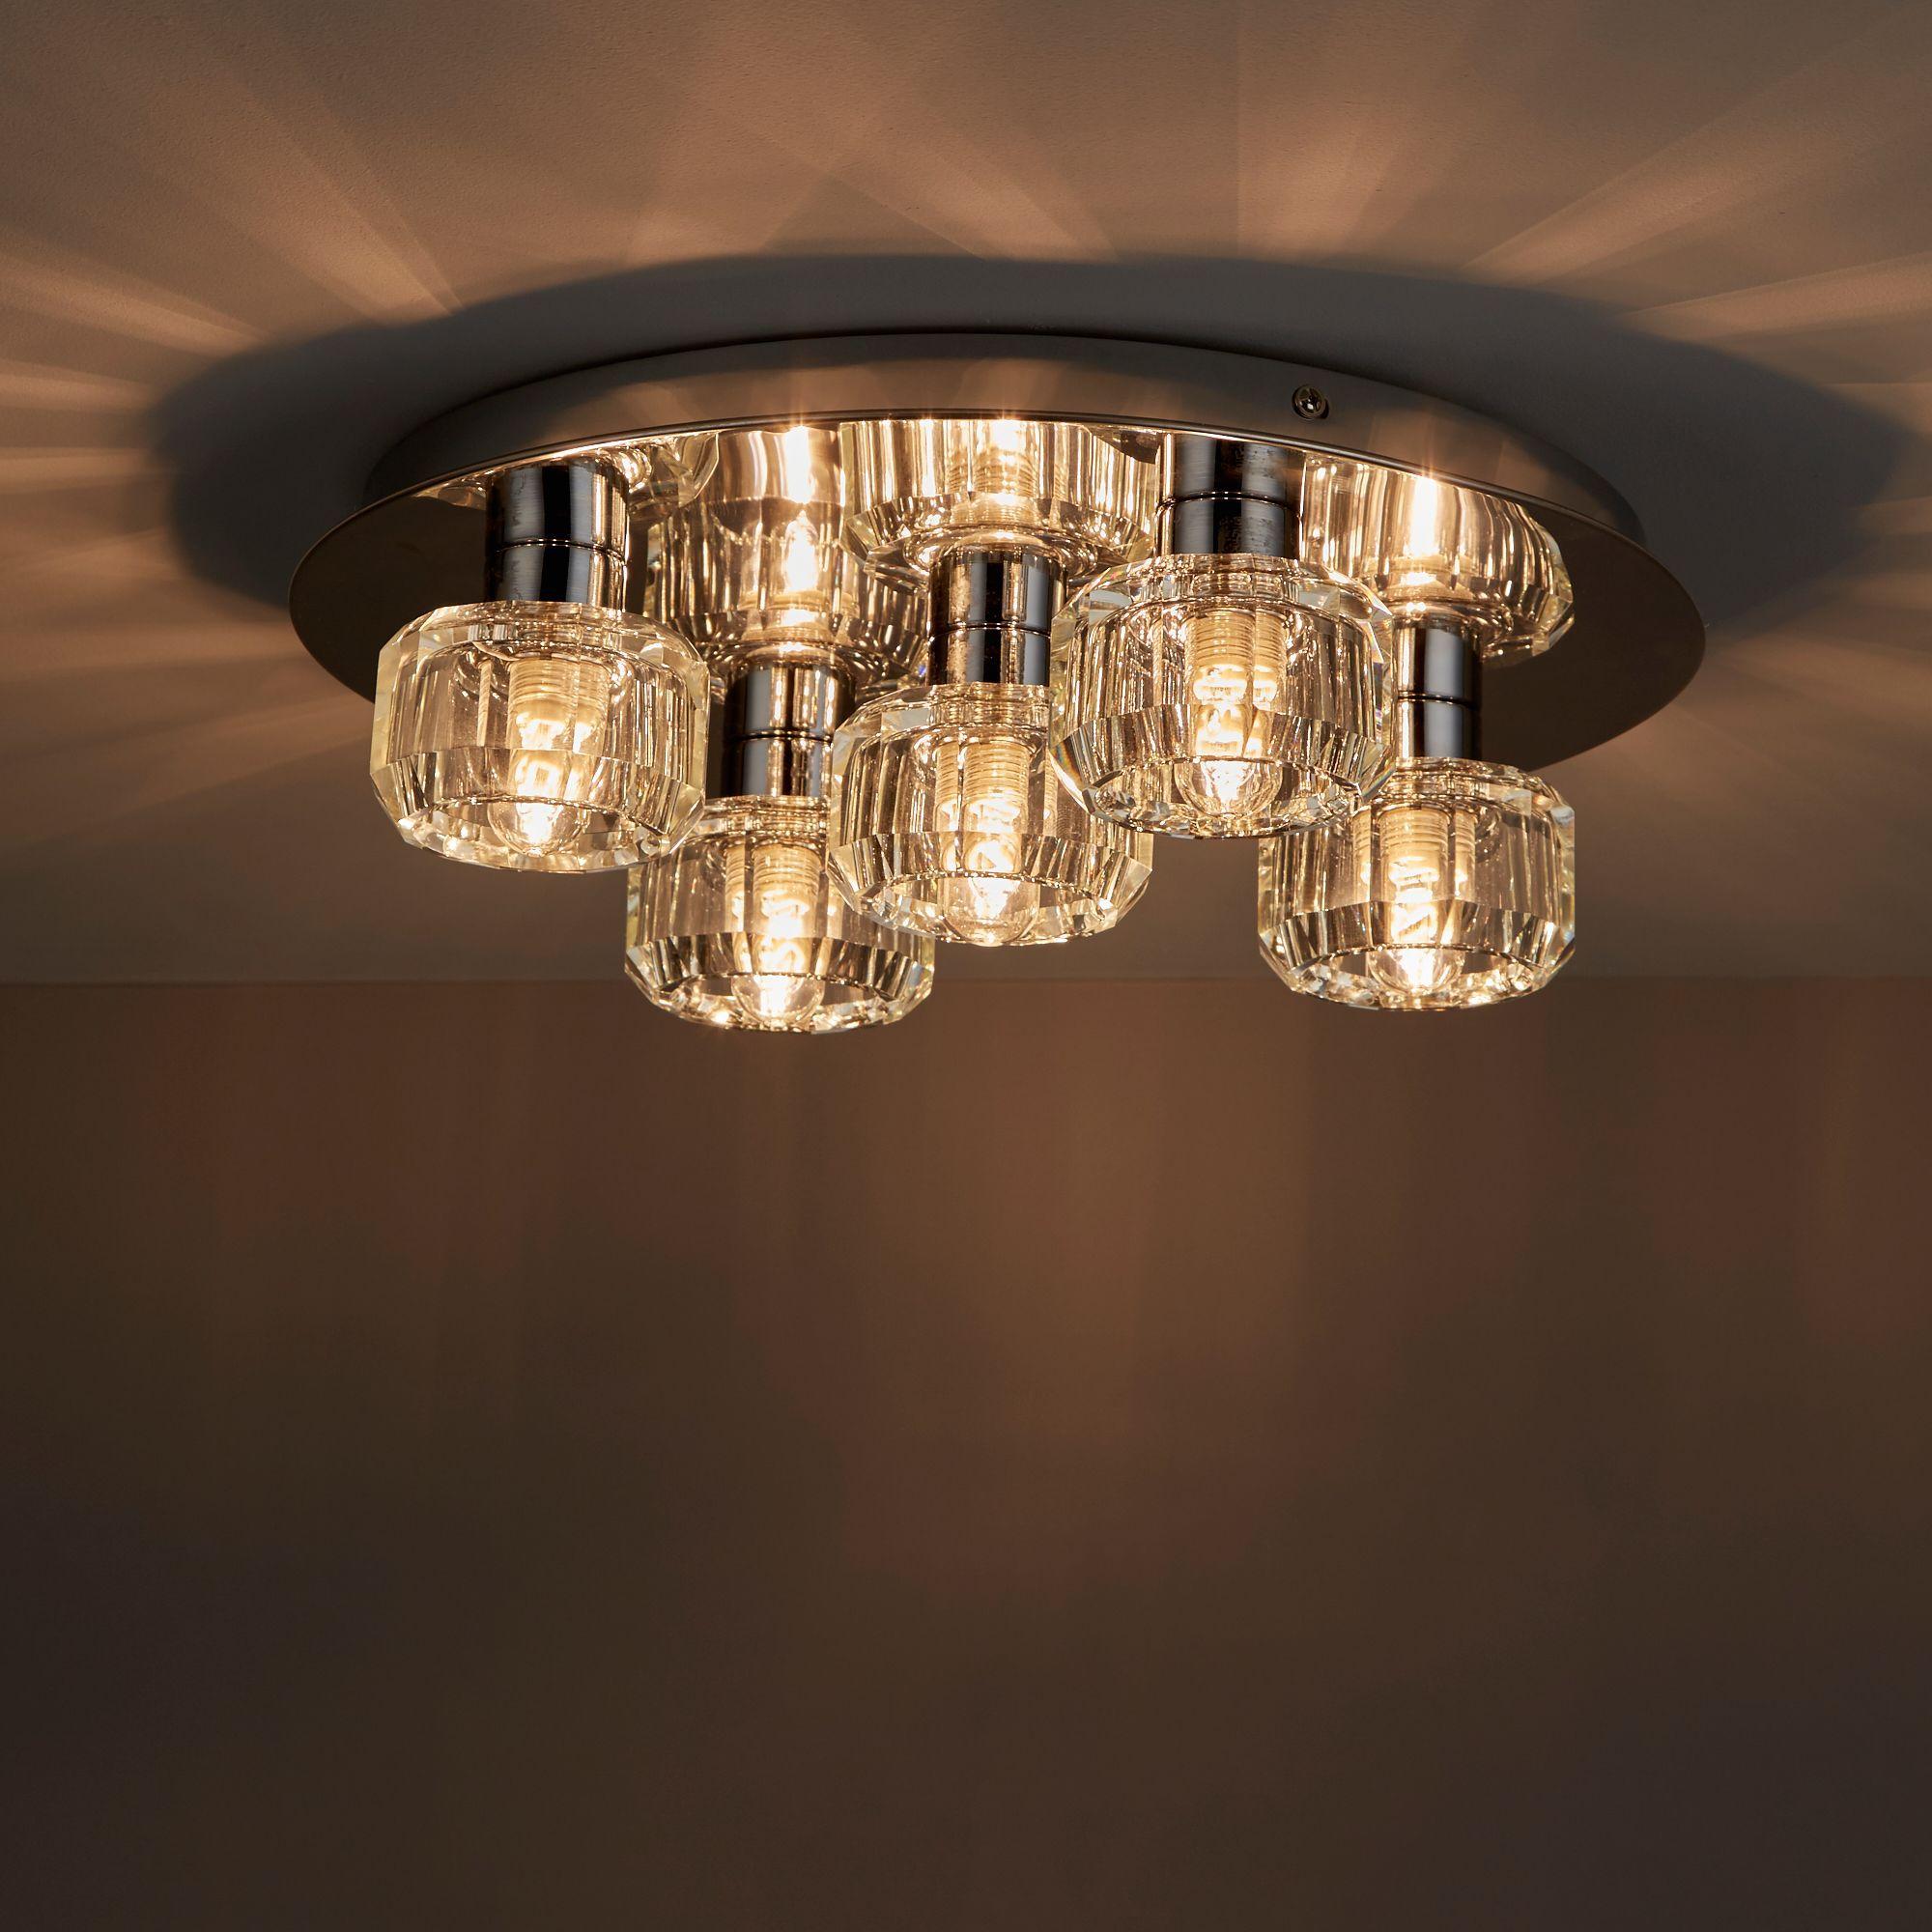 Apsley clear chrome effect 5 lamp bathroom ceiling light for B q bathroom accessories